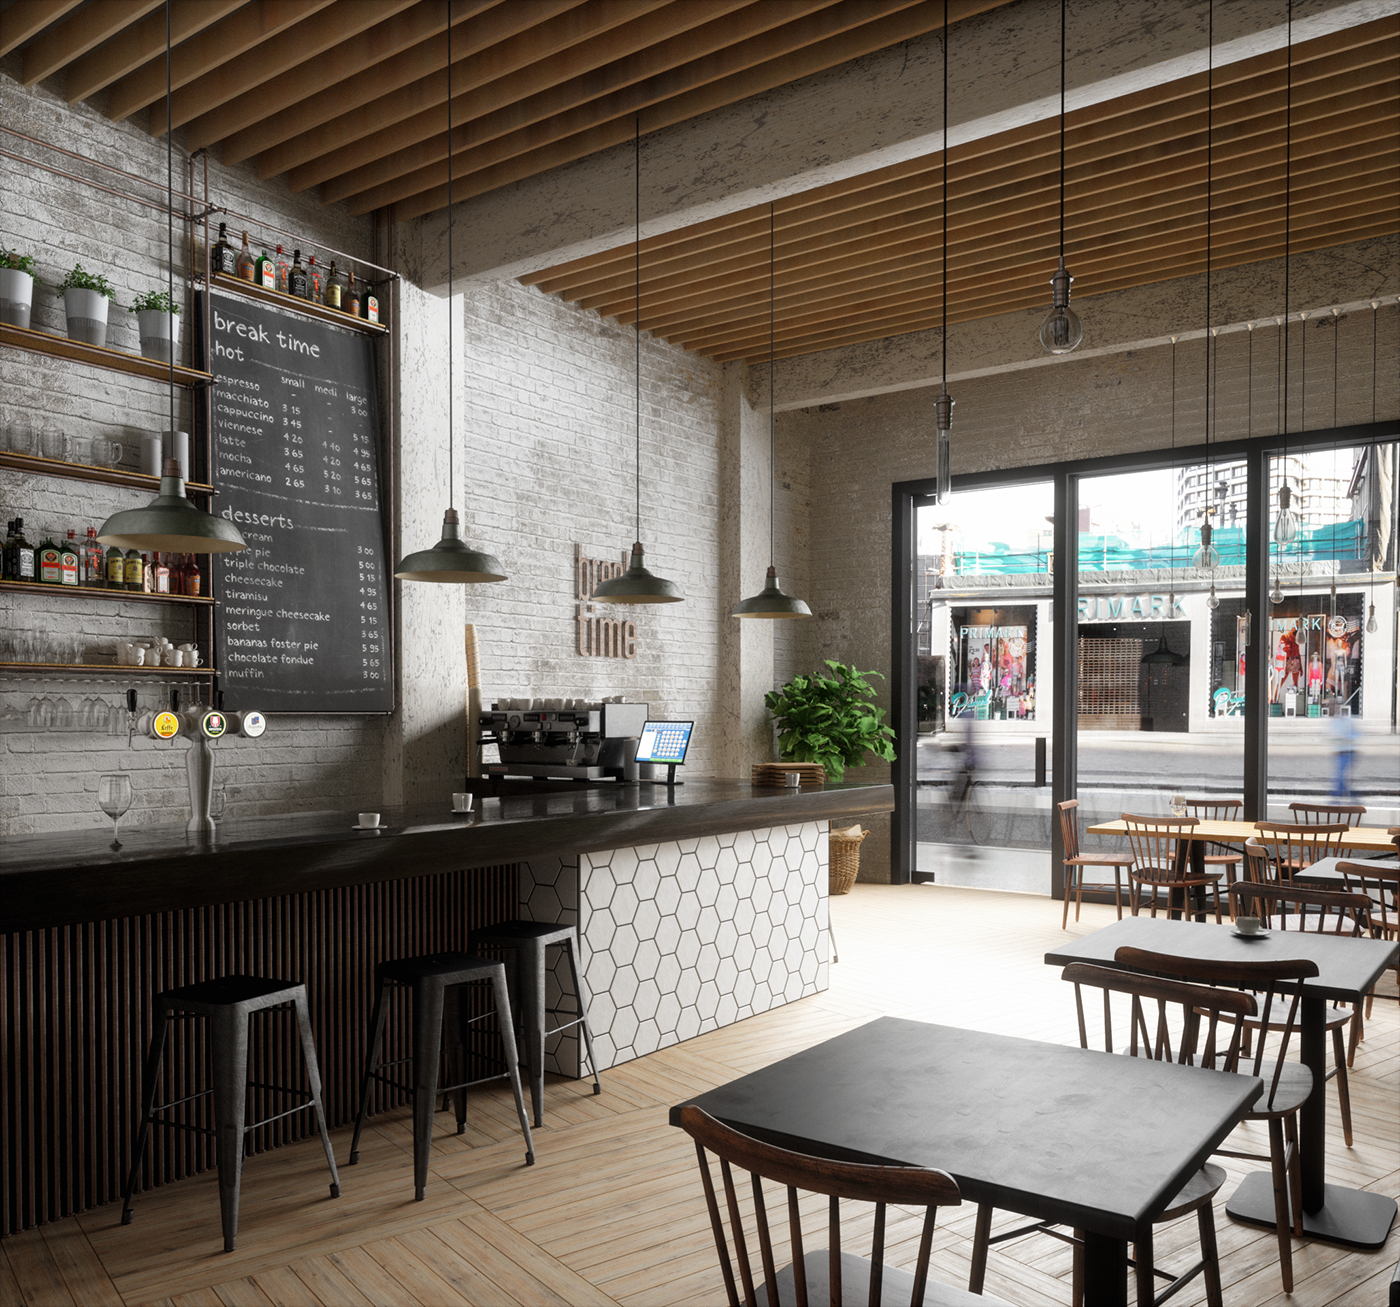 Break time caf on behance for Small cafe bar design